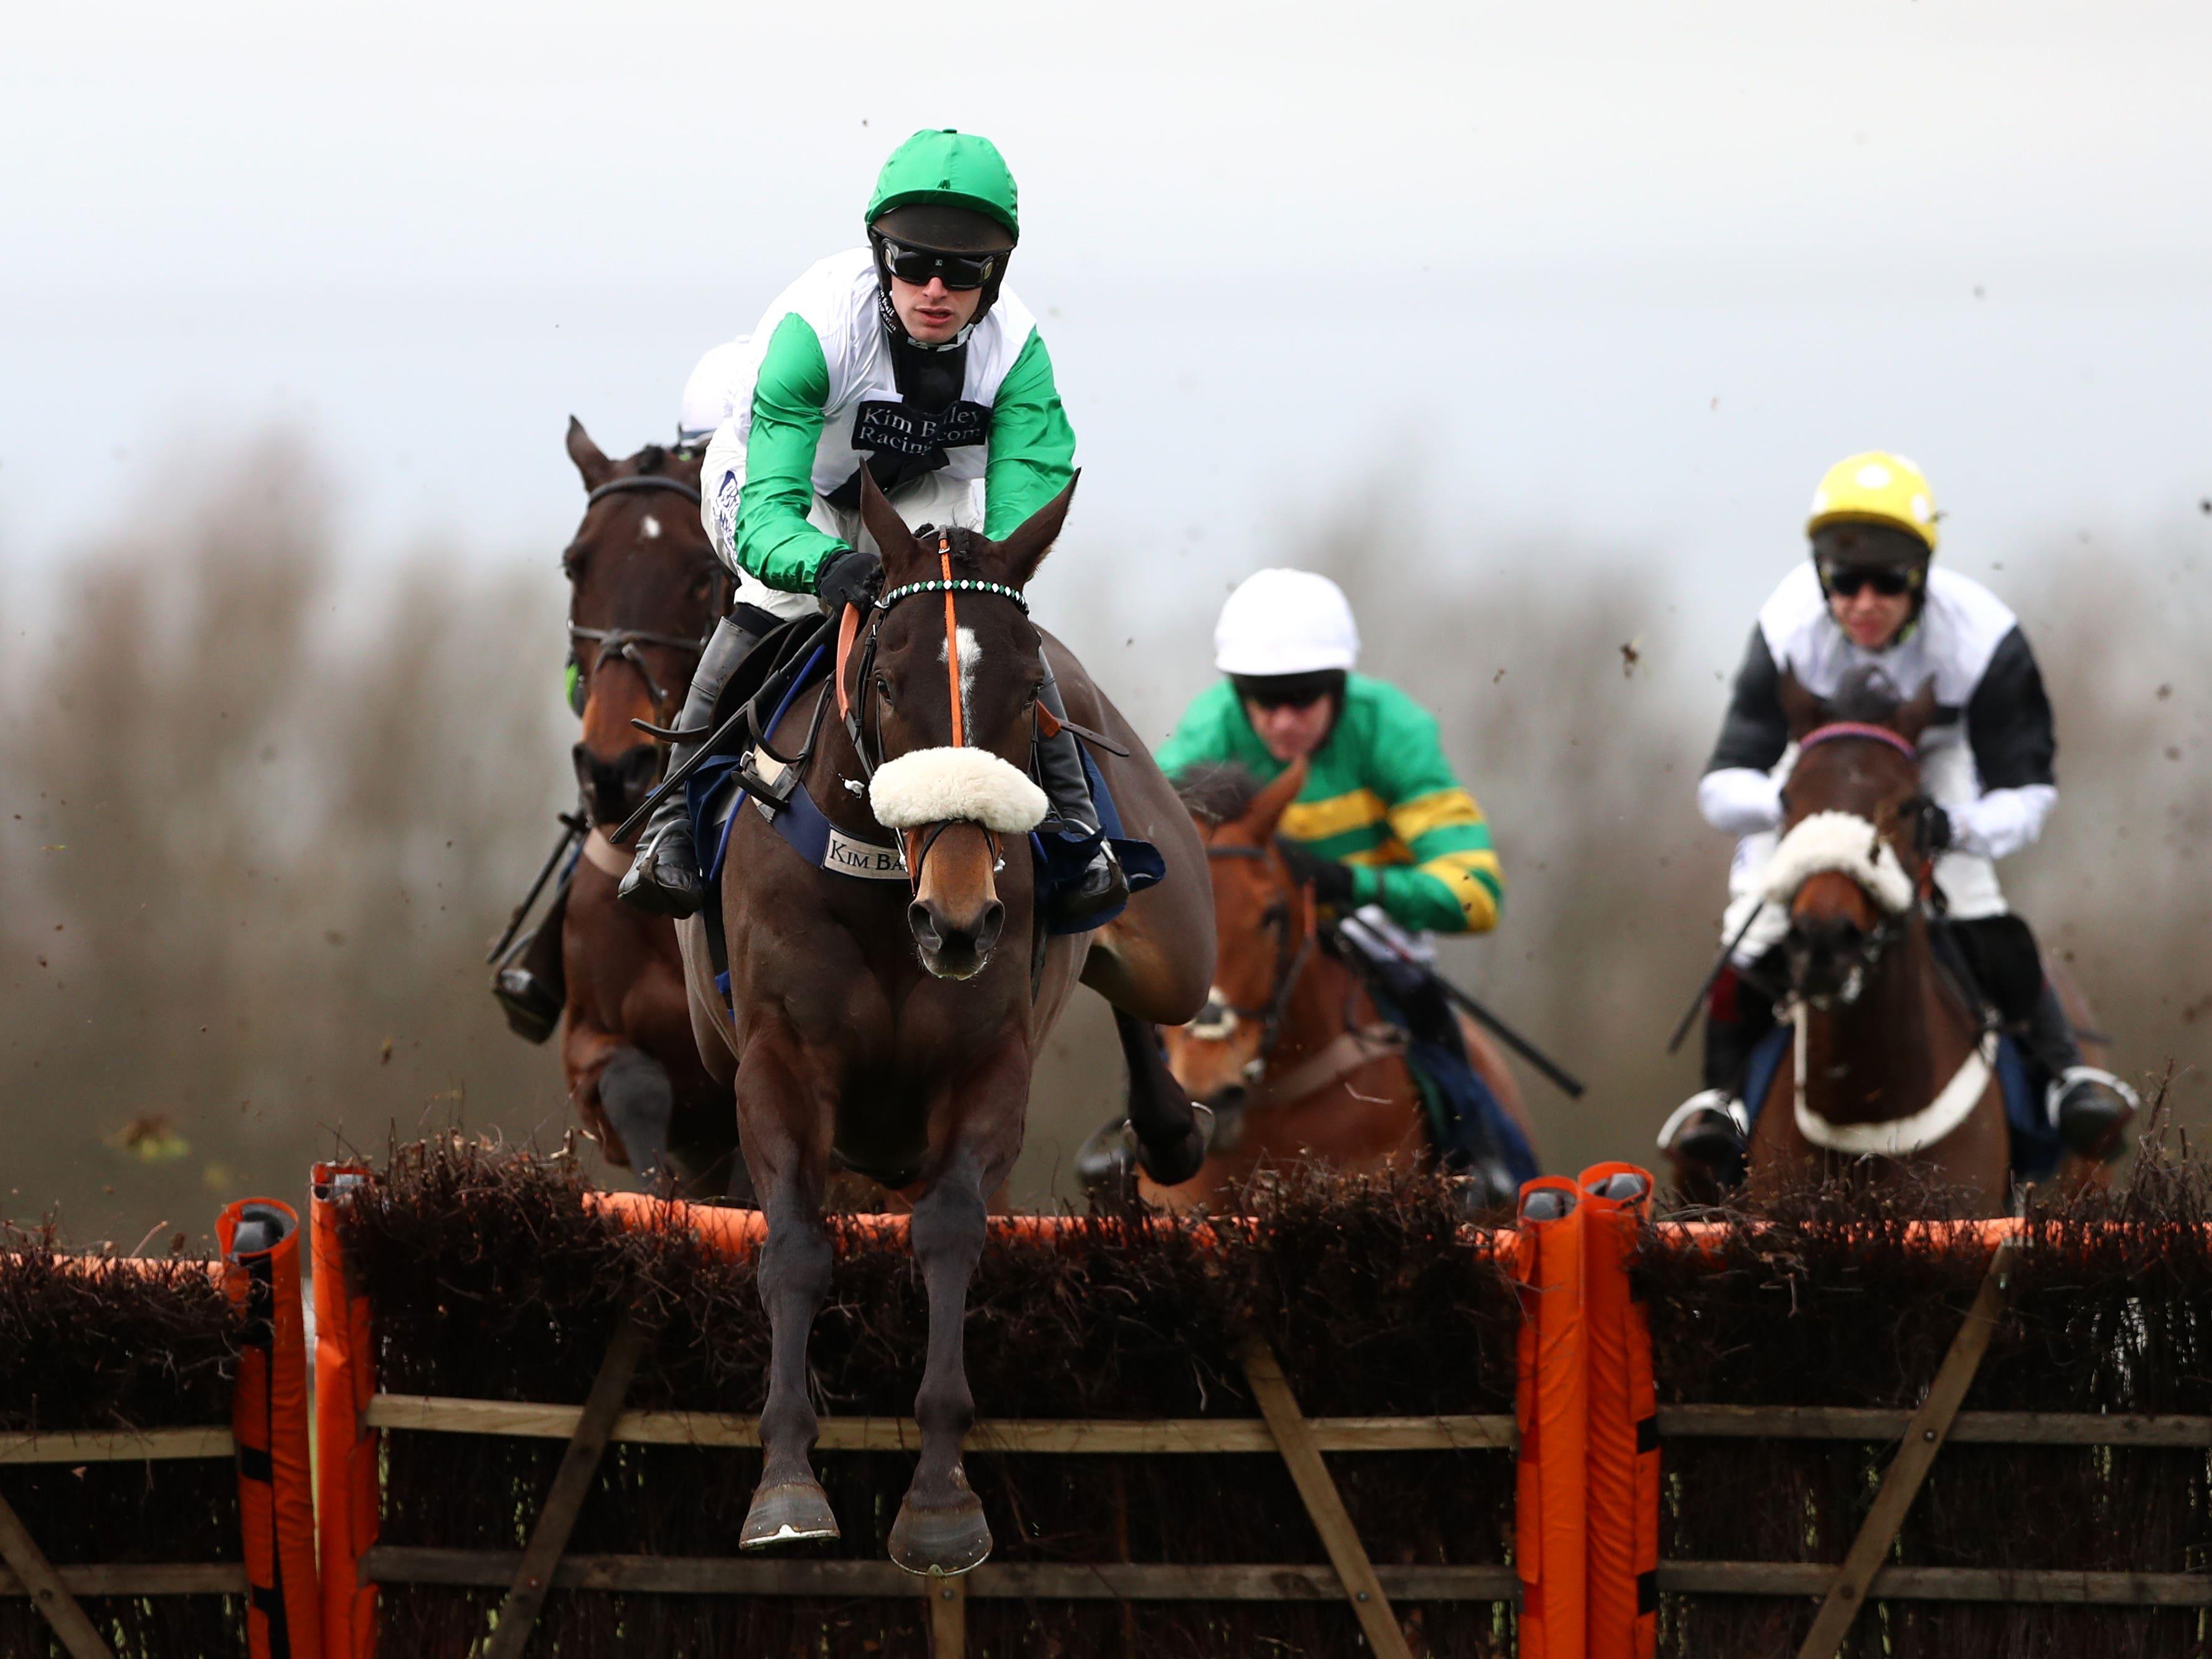 Vinndication landed a big pot at Ascot on Saturday (Tim Goode/PA)